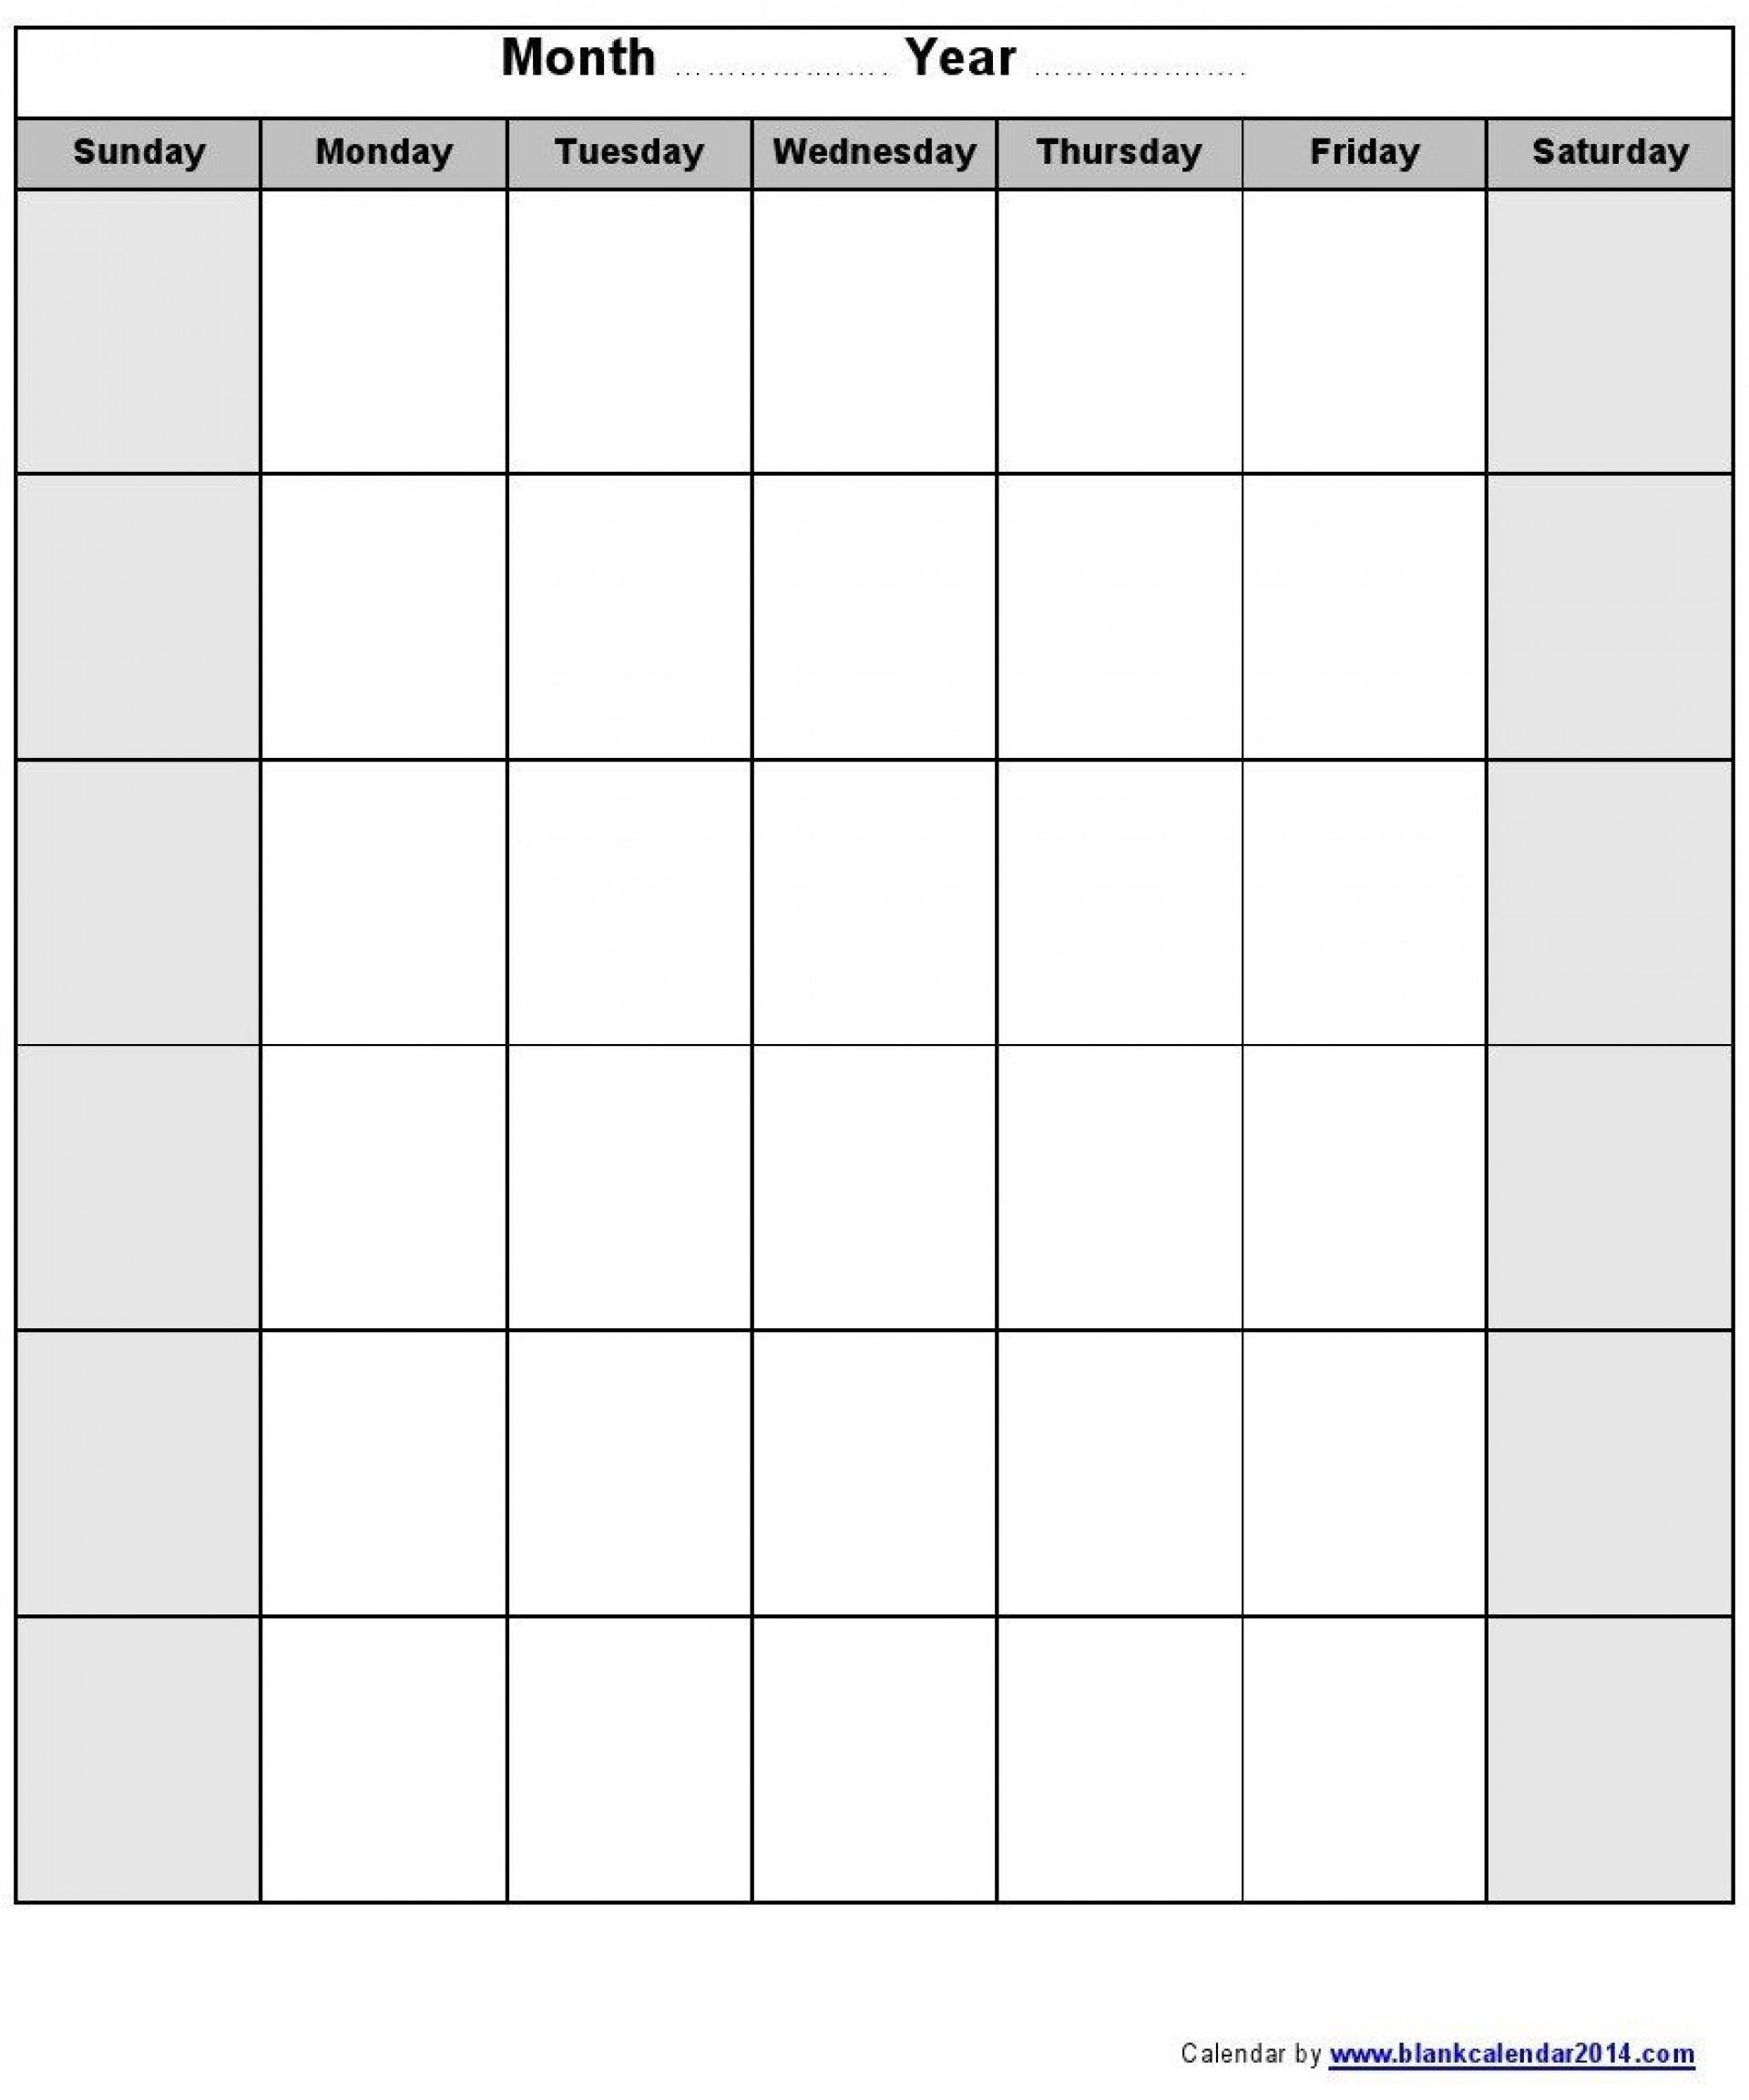 009 Impressive Printable Blank Monthly Calendar Template Image  Pdf1920